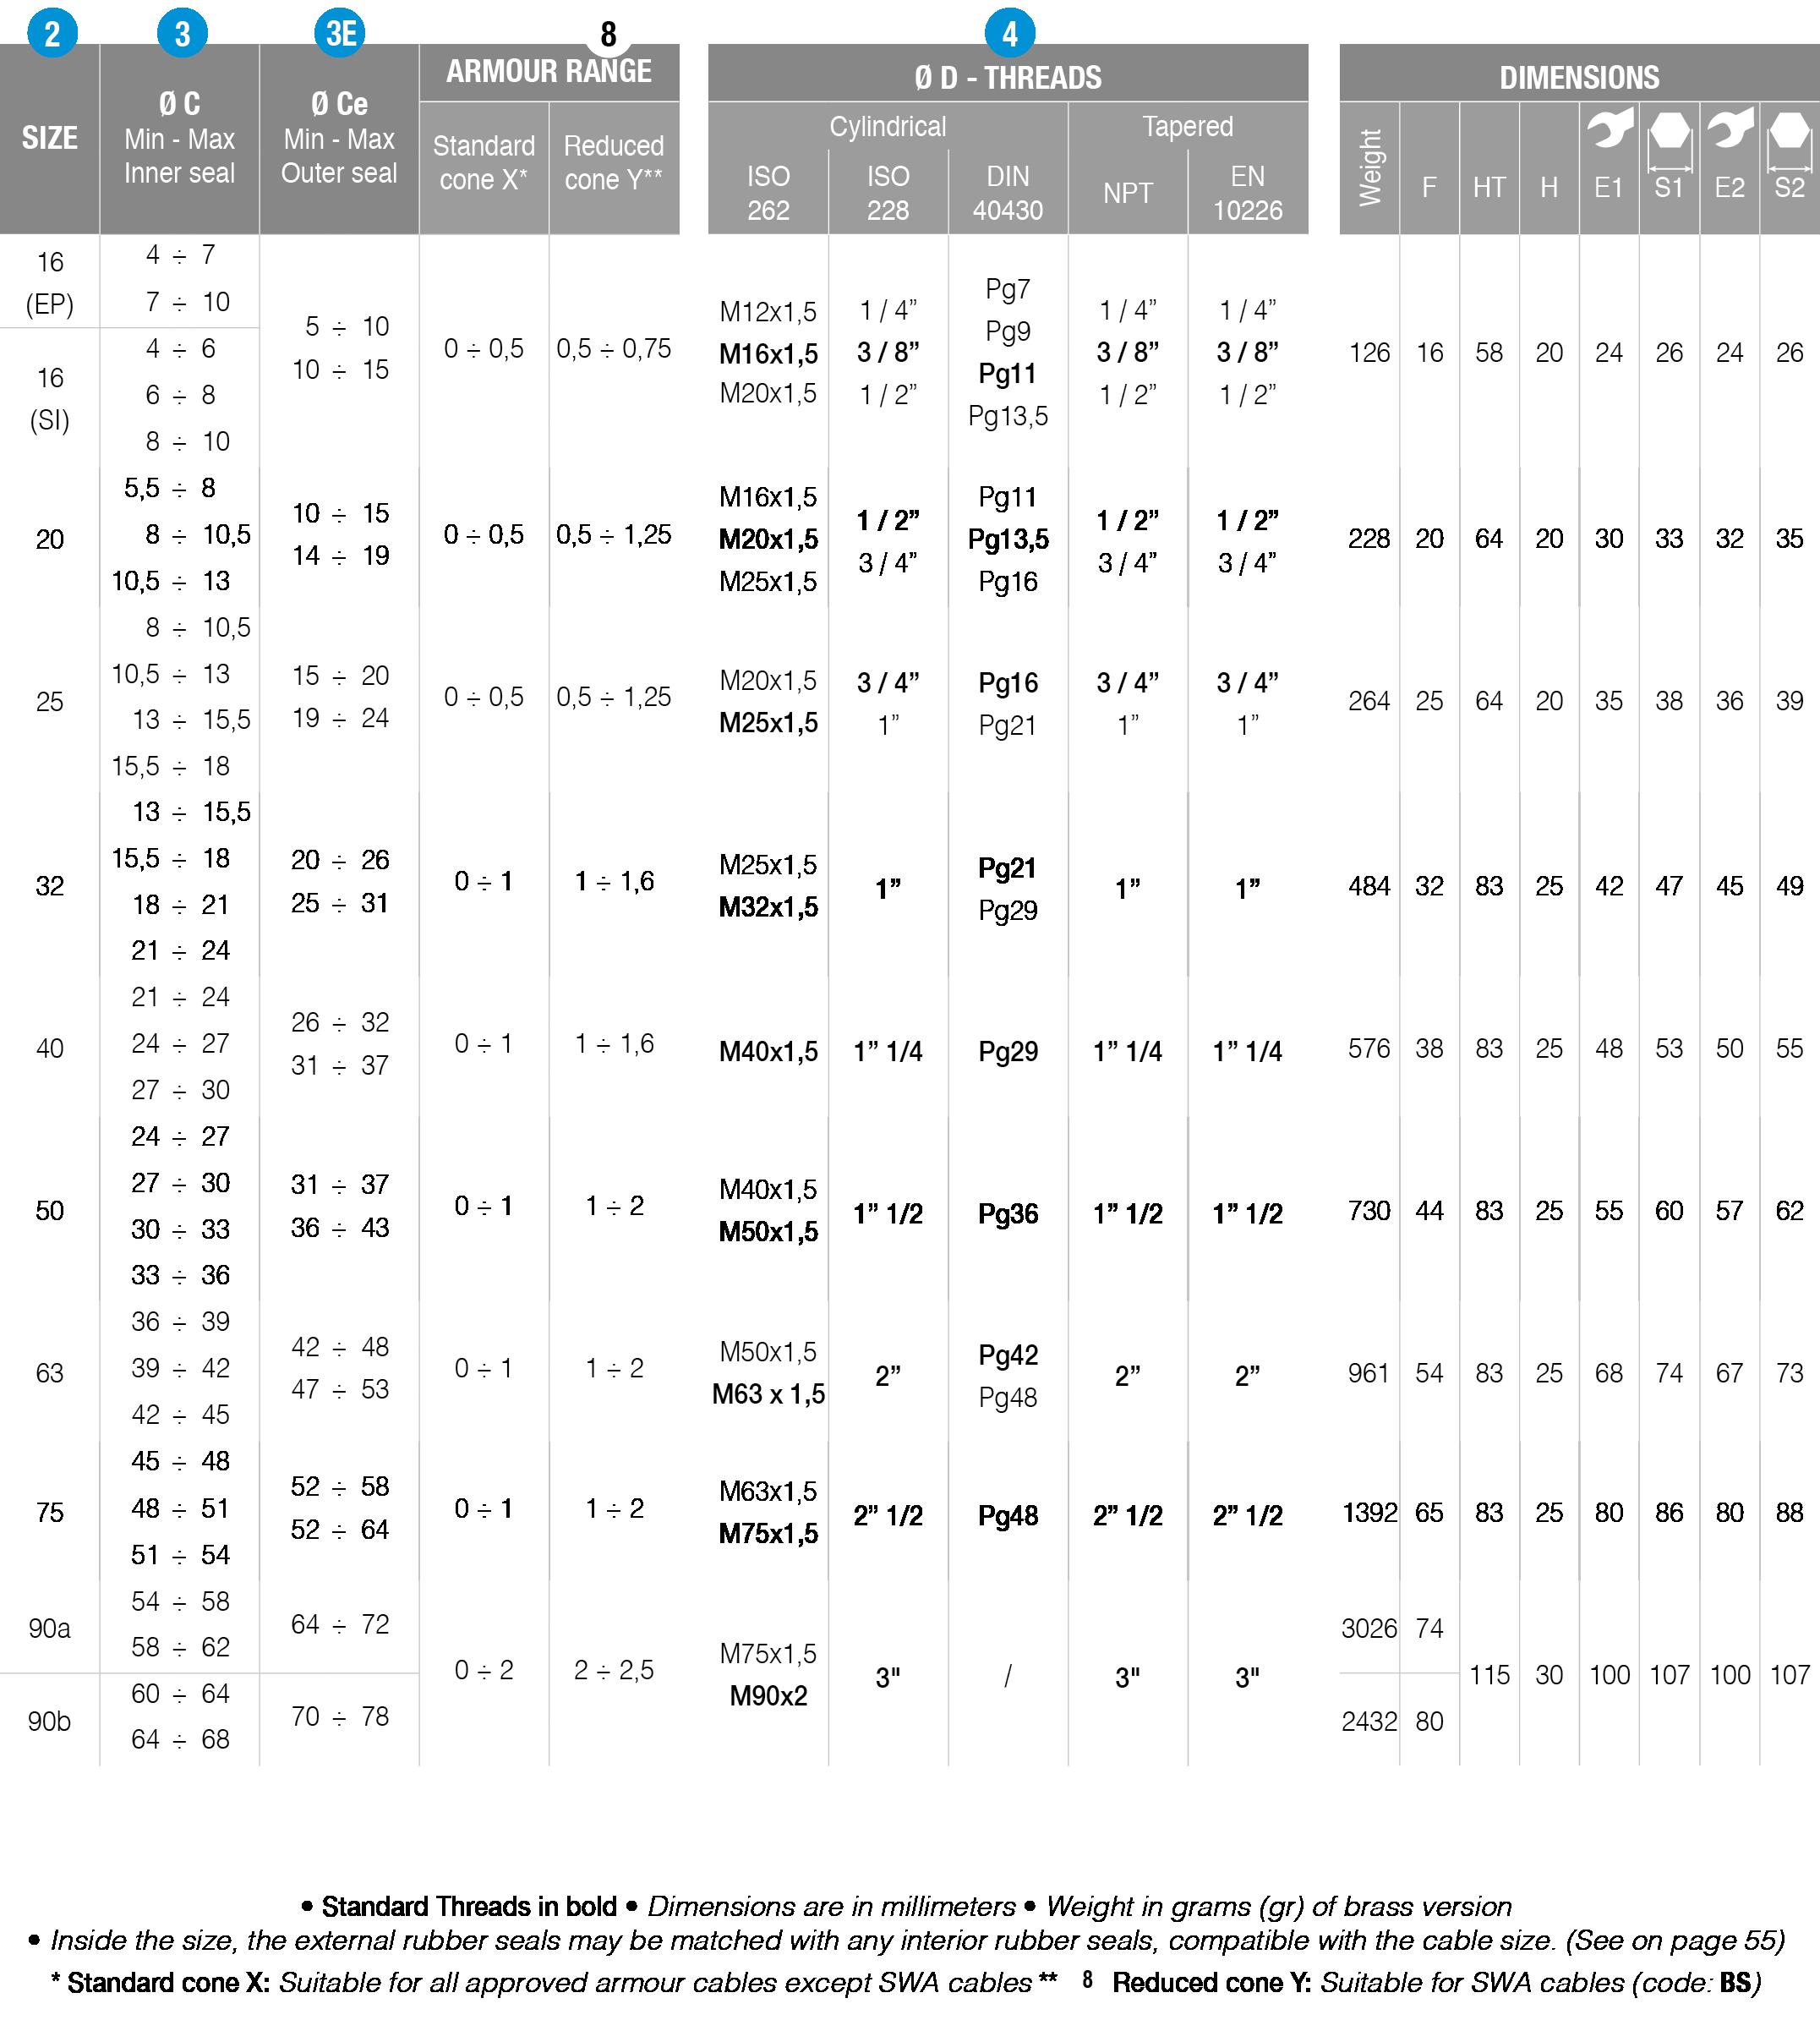 BATD-type-table-details